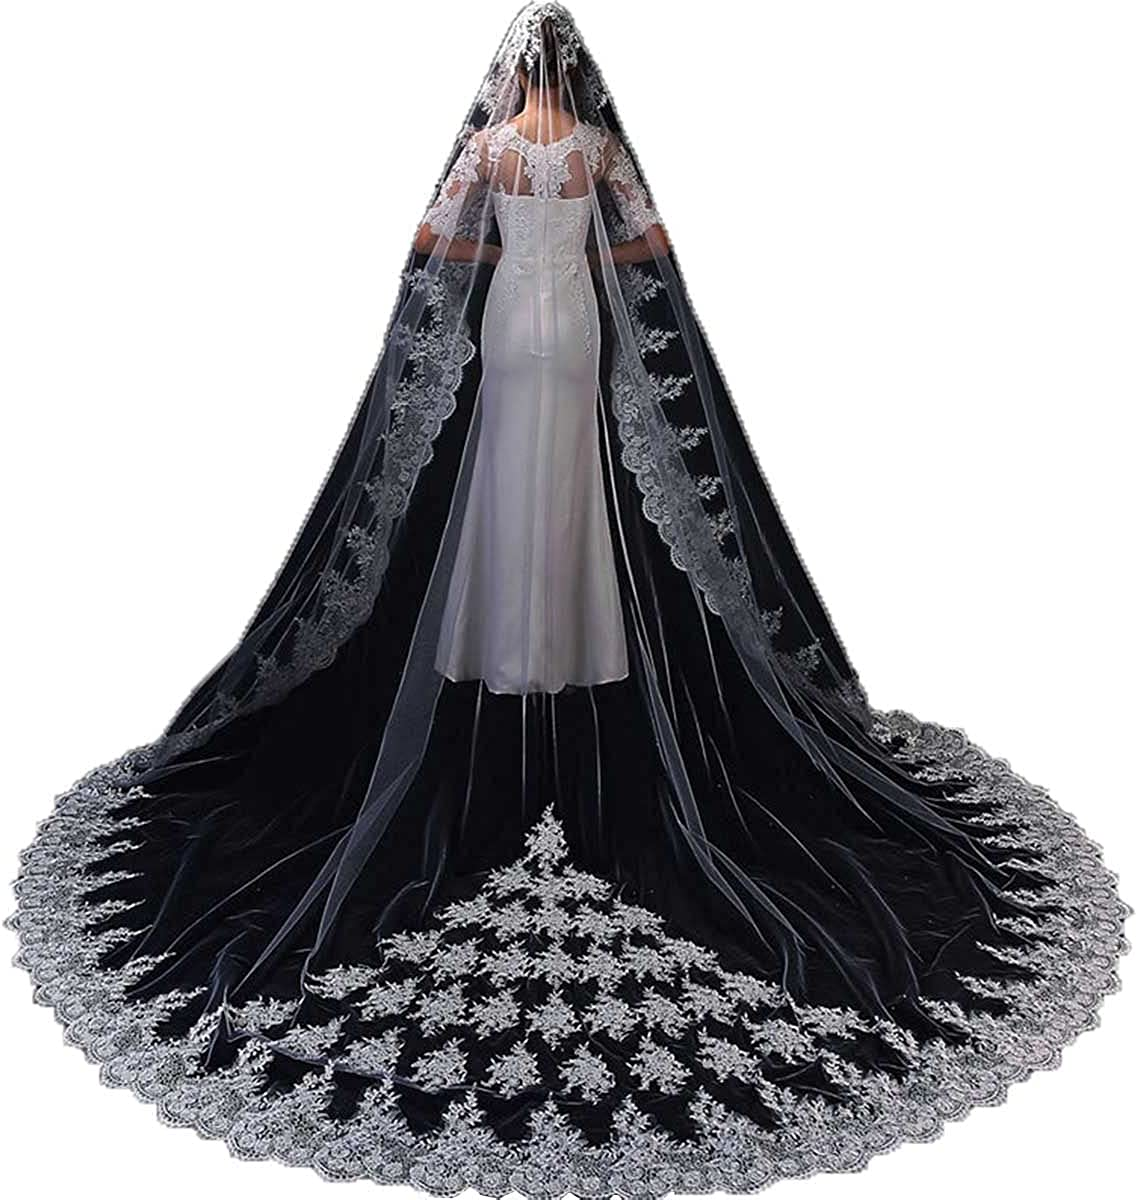 1T Gorgeous Lace Cathedral Veil Bridal Veil Chapel Length Applique Veil Women's Veil with Comb Tulle Veil for Wedding